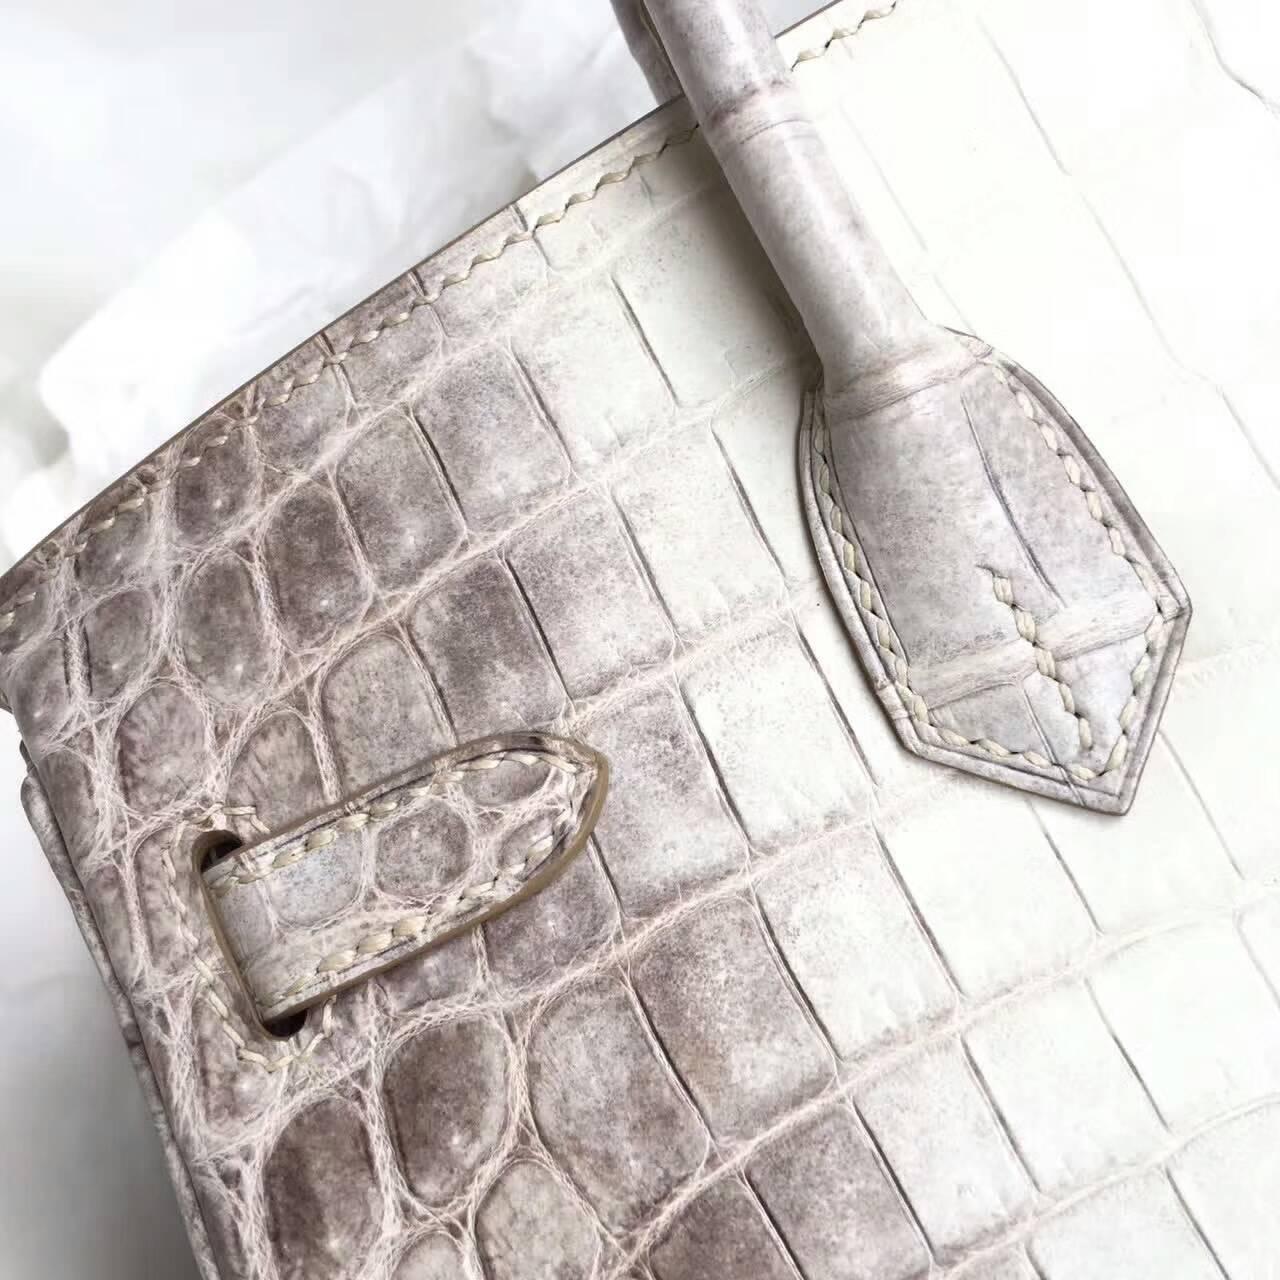 Birkin铂金包 Hermes包包 25cm Shiny Niloticus Crocodile 雾面两点非洲原产尼罗鳄 Mimalaya 喜马拉雅 银扣